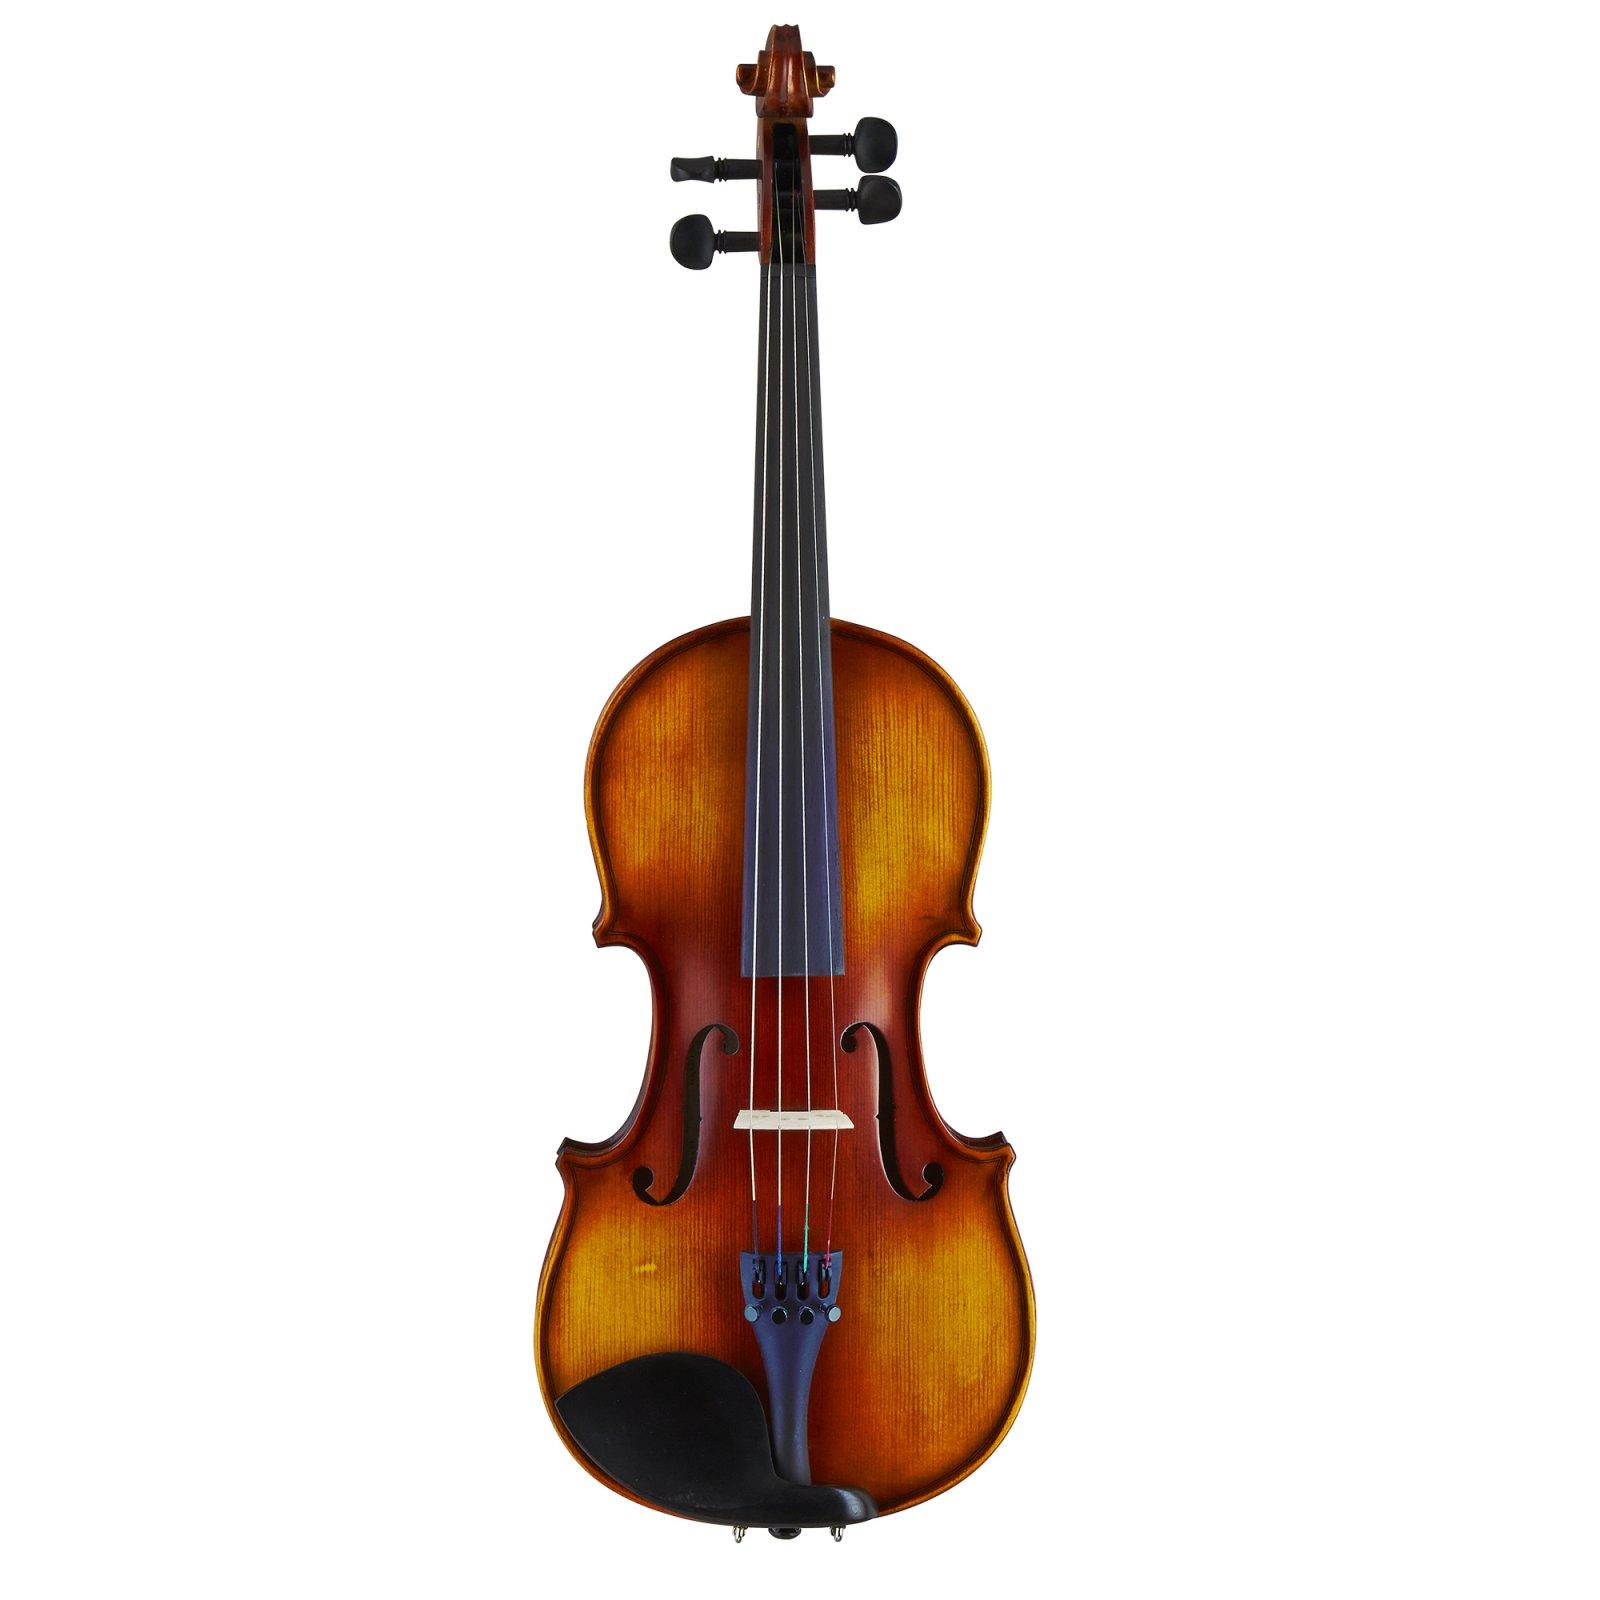 Sebastian 110VN12 1/2 Size Violin Outift